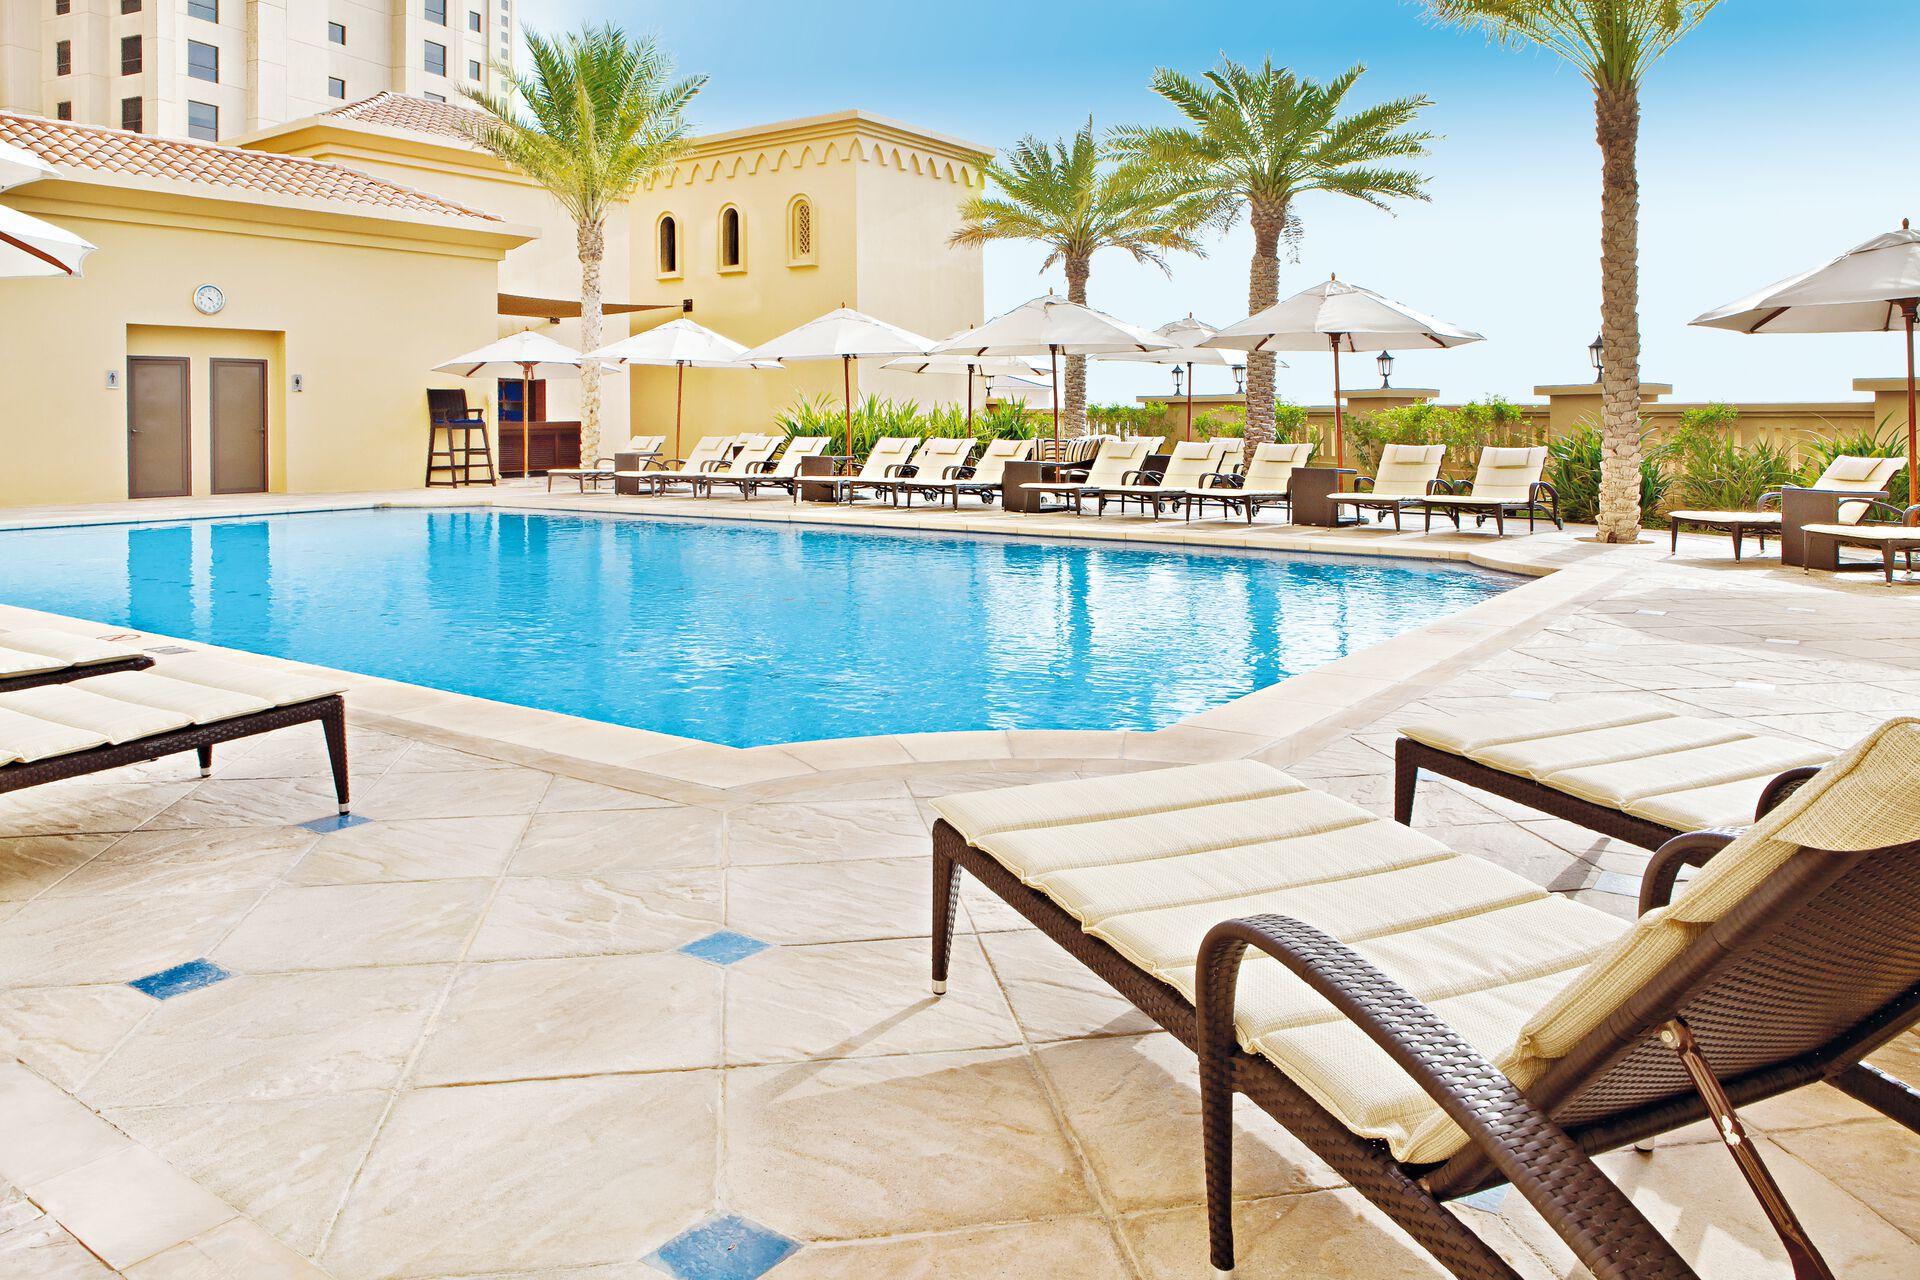 Séjour Emirats Arabes Unis - Hilton Dubai The Walk - 4*